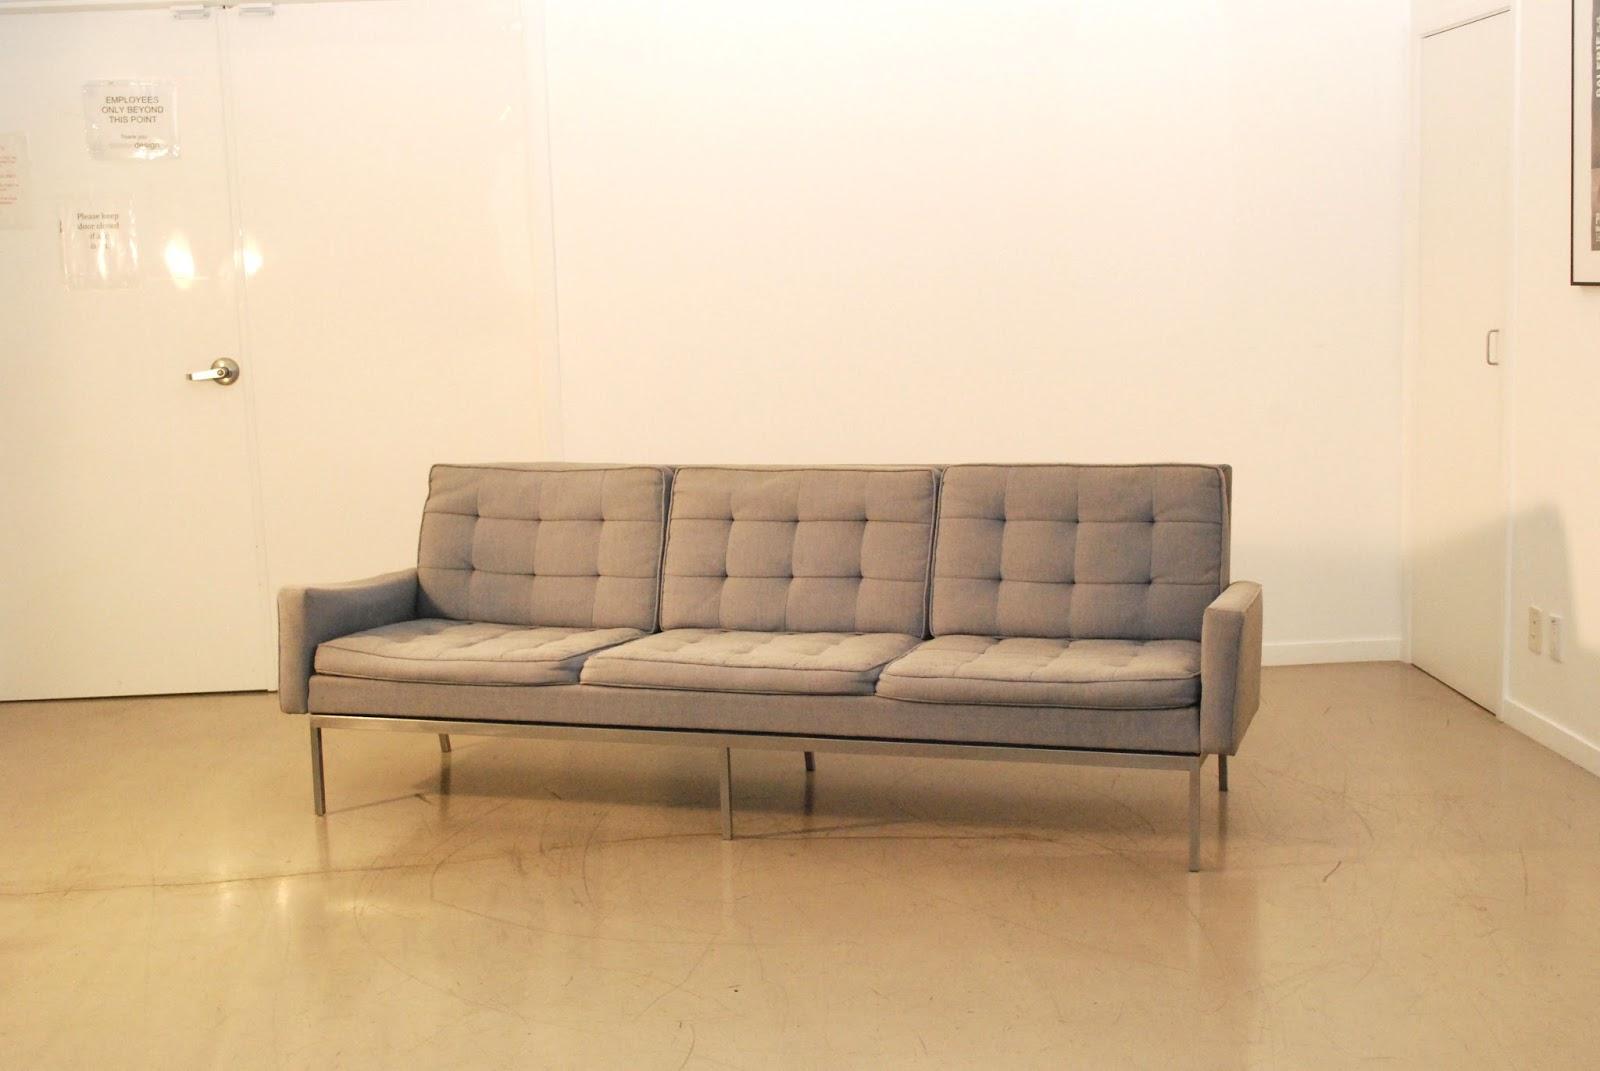 Vintage Florence Knoll Sofa